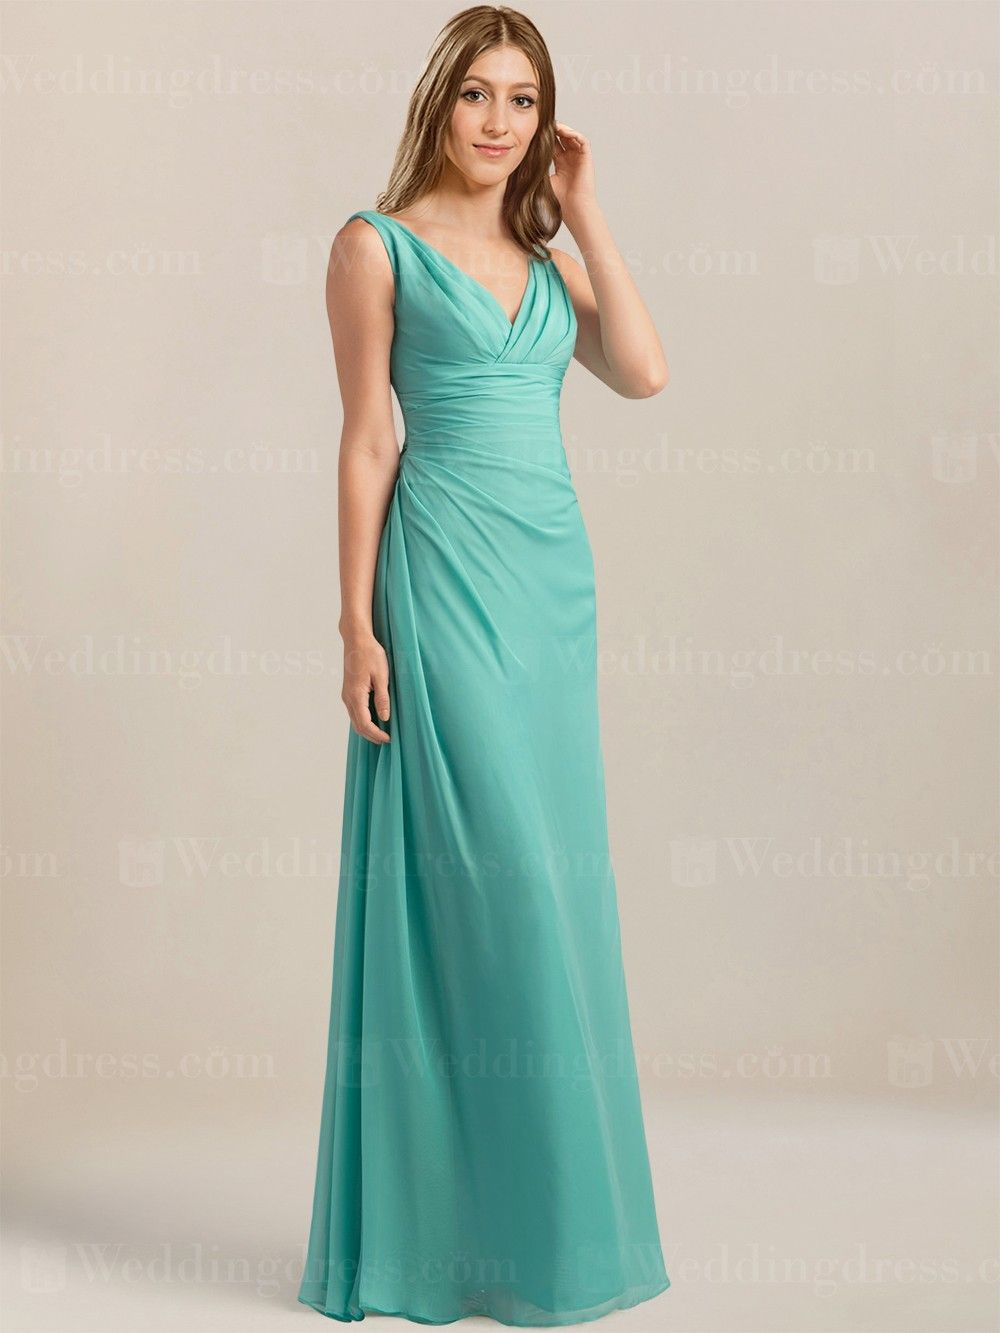 Amazing Pat Catans Prom Dresses Illustration - Wedding Plan Ideas ...